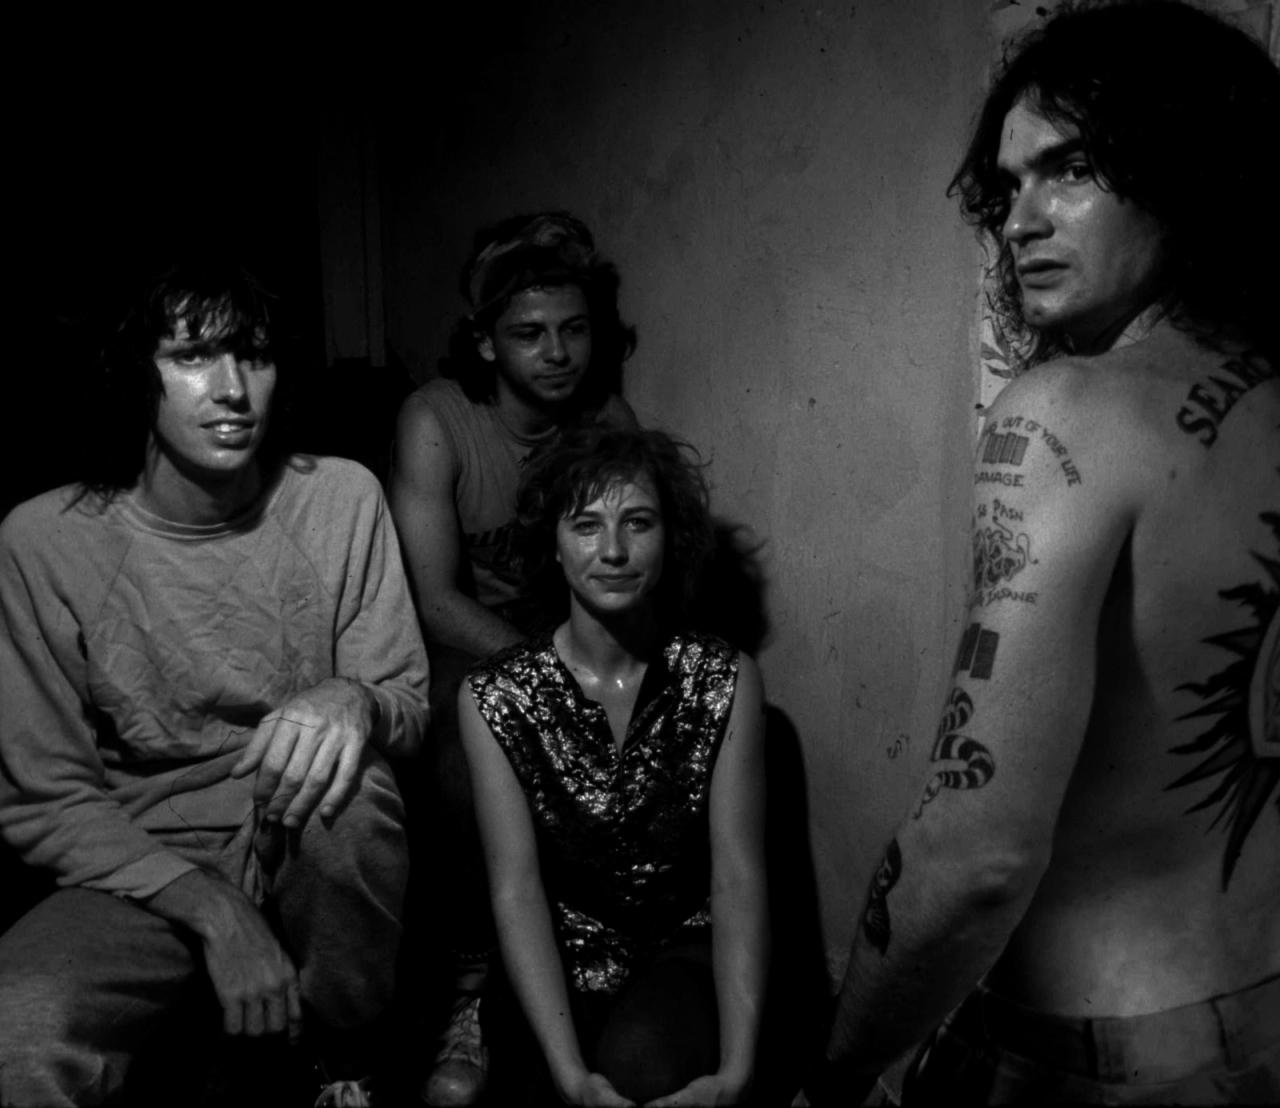 Kira con Black Flag en 1985. Fotografía: Ben DeSoto